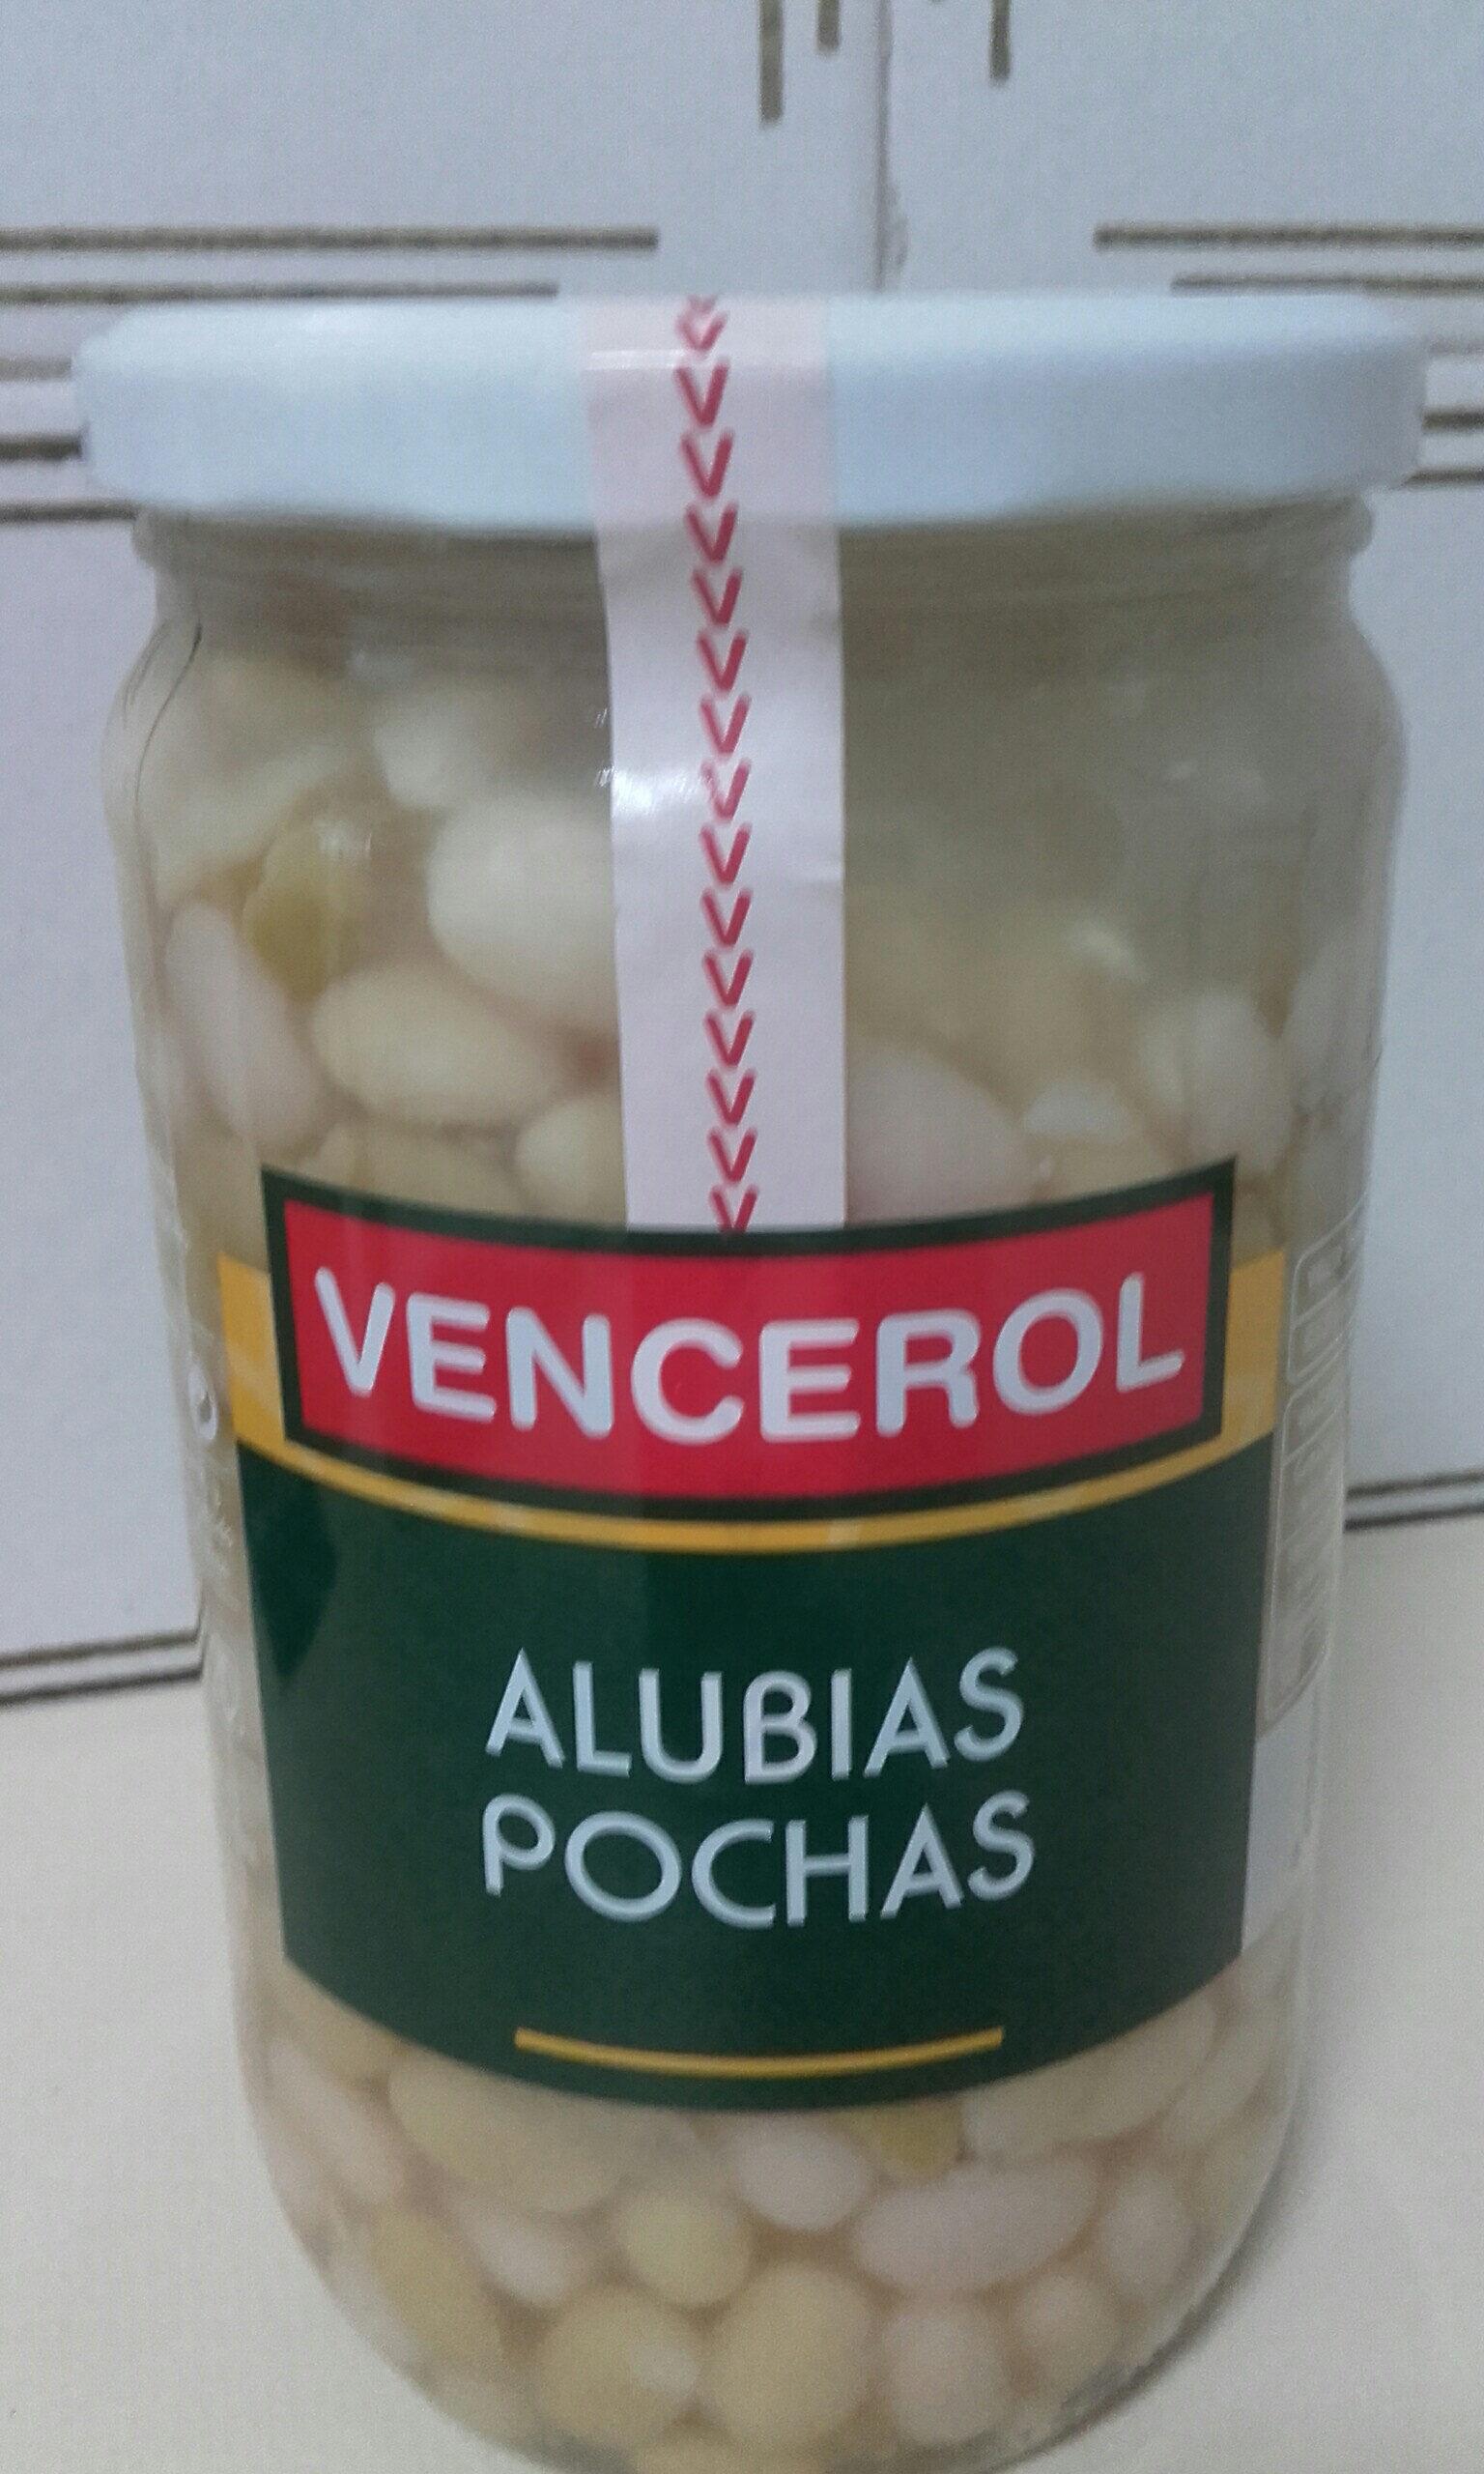 Alubias pochas - Product